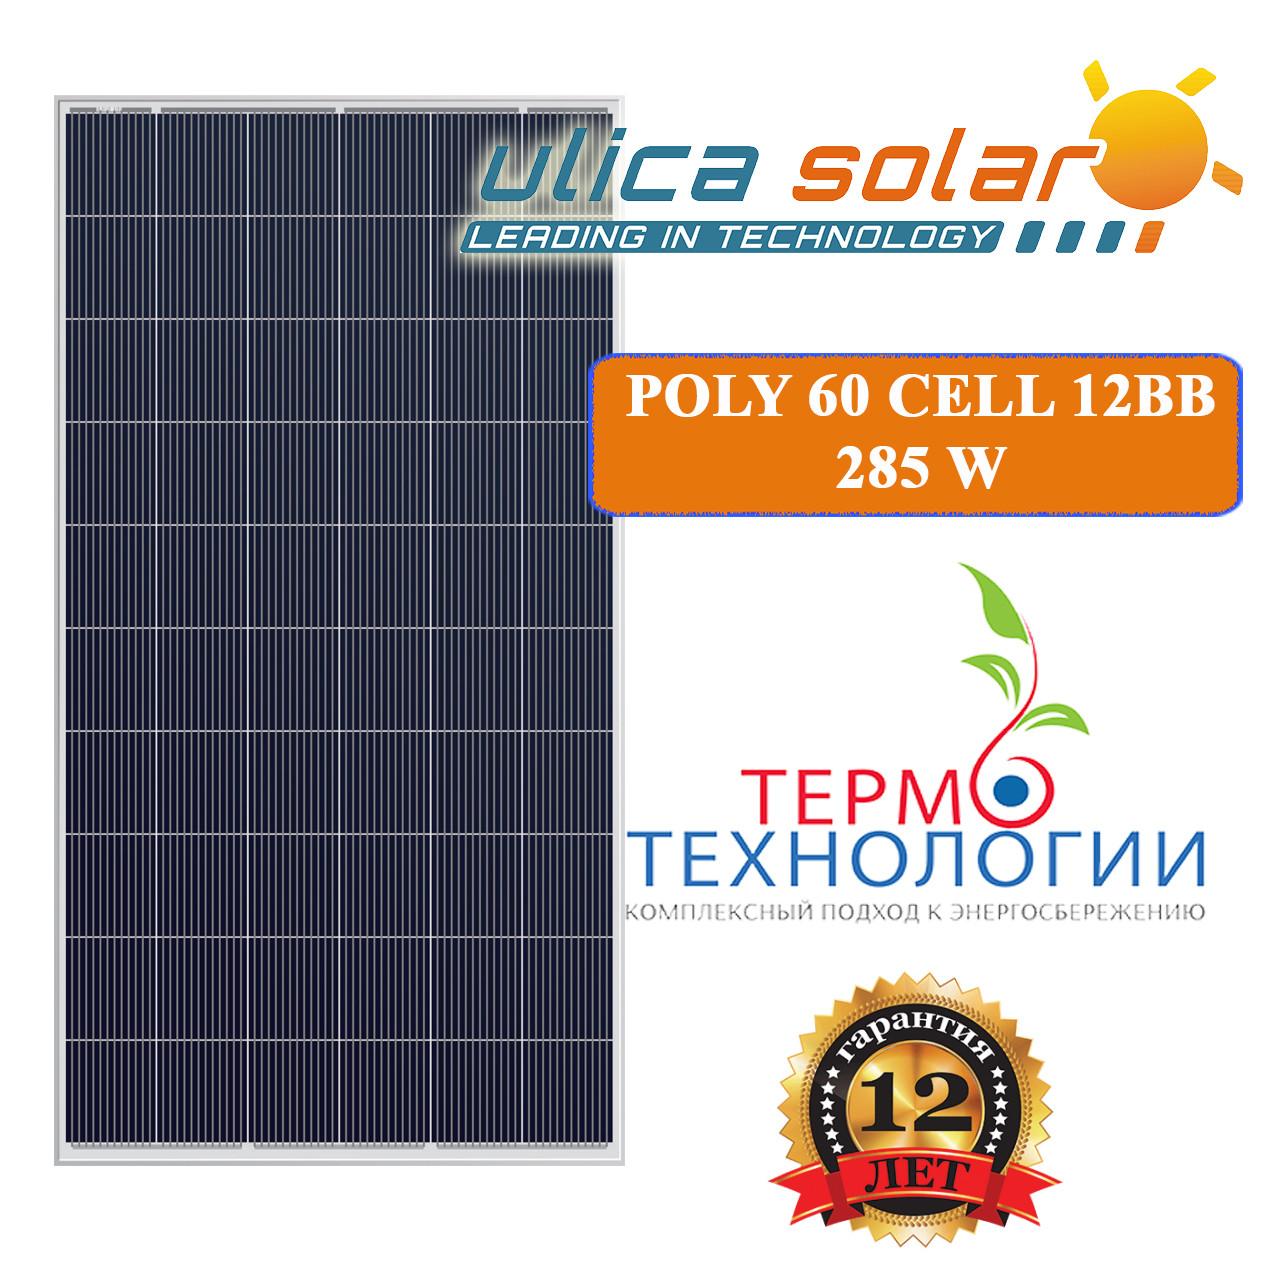 Солнечная батарея Ulica Solar 285 Вт, Poly